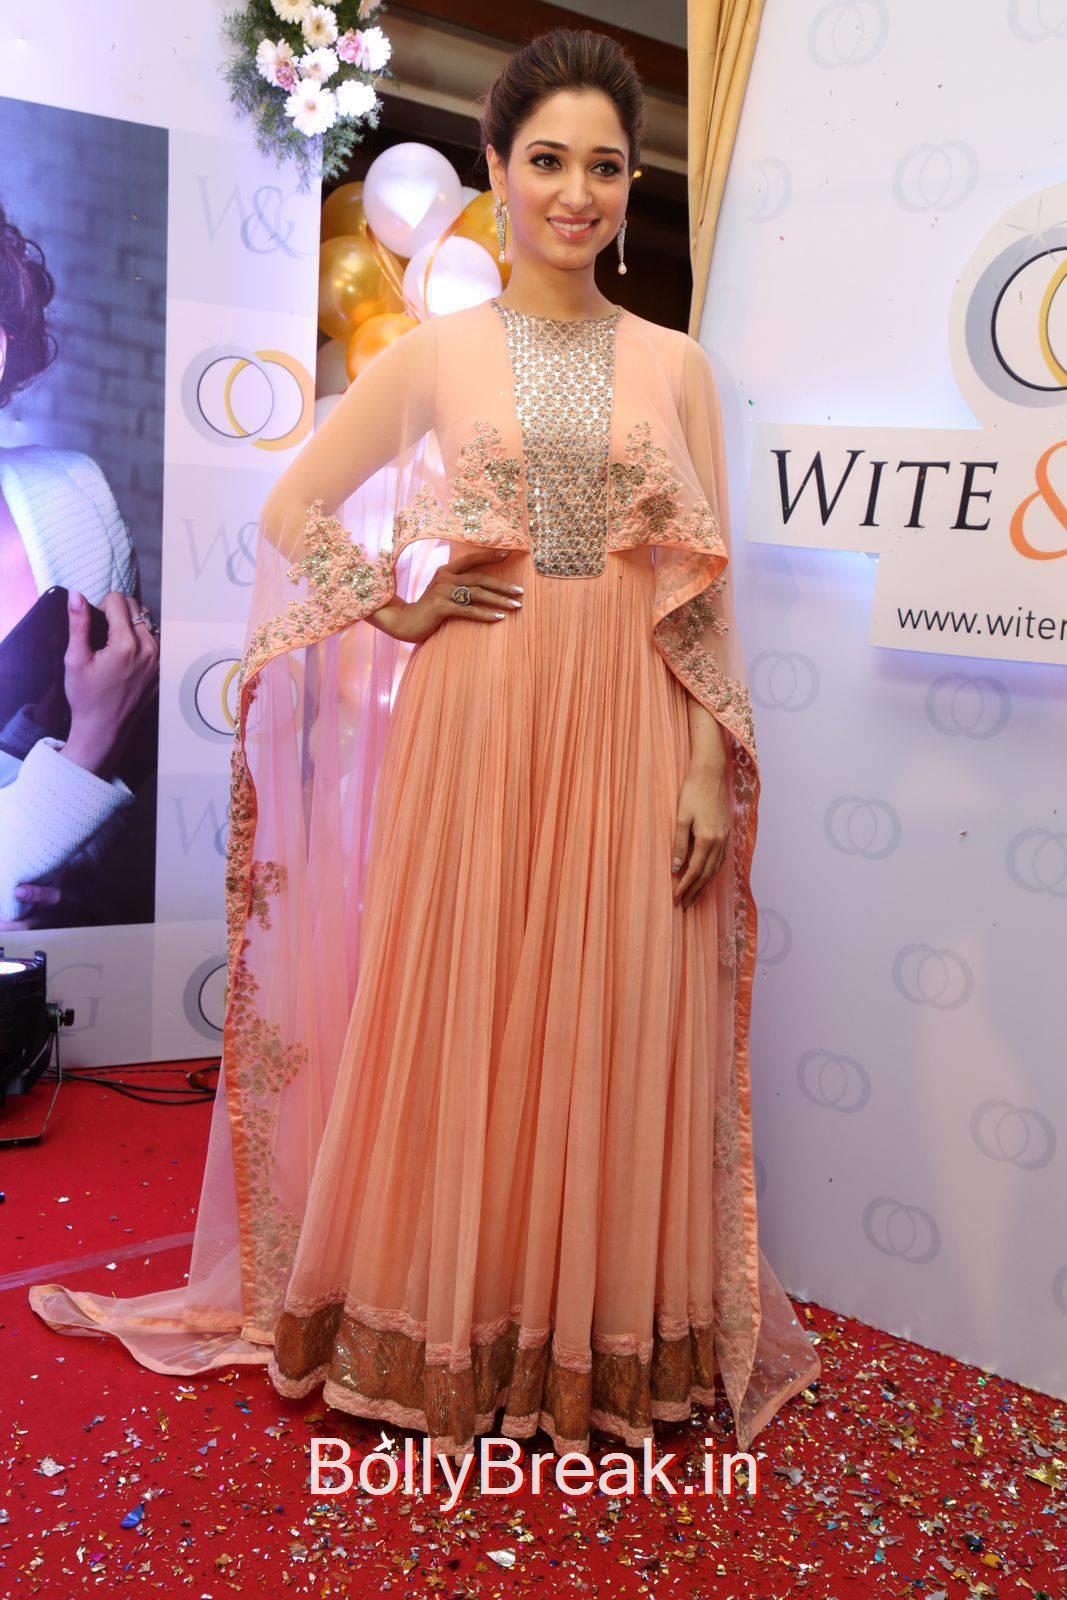 Tamanna images, Tamanna Bhatia Whitegold.Com Venture launch Pics